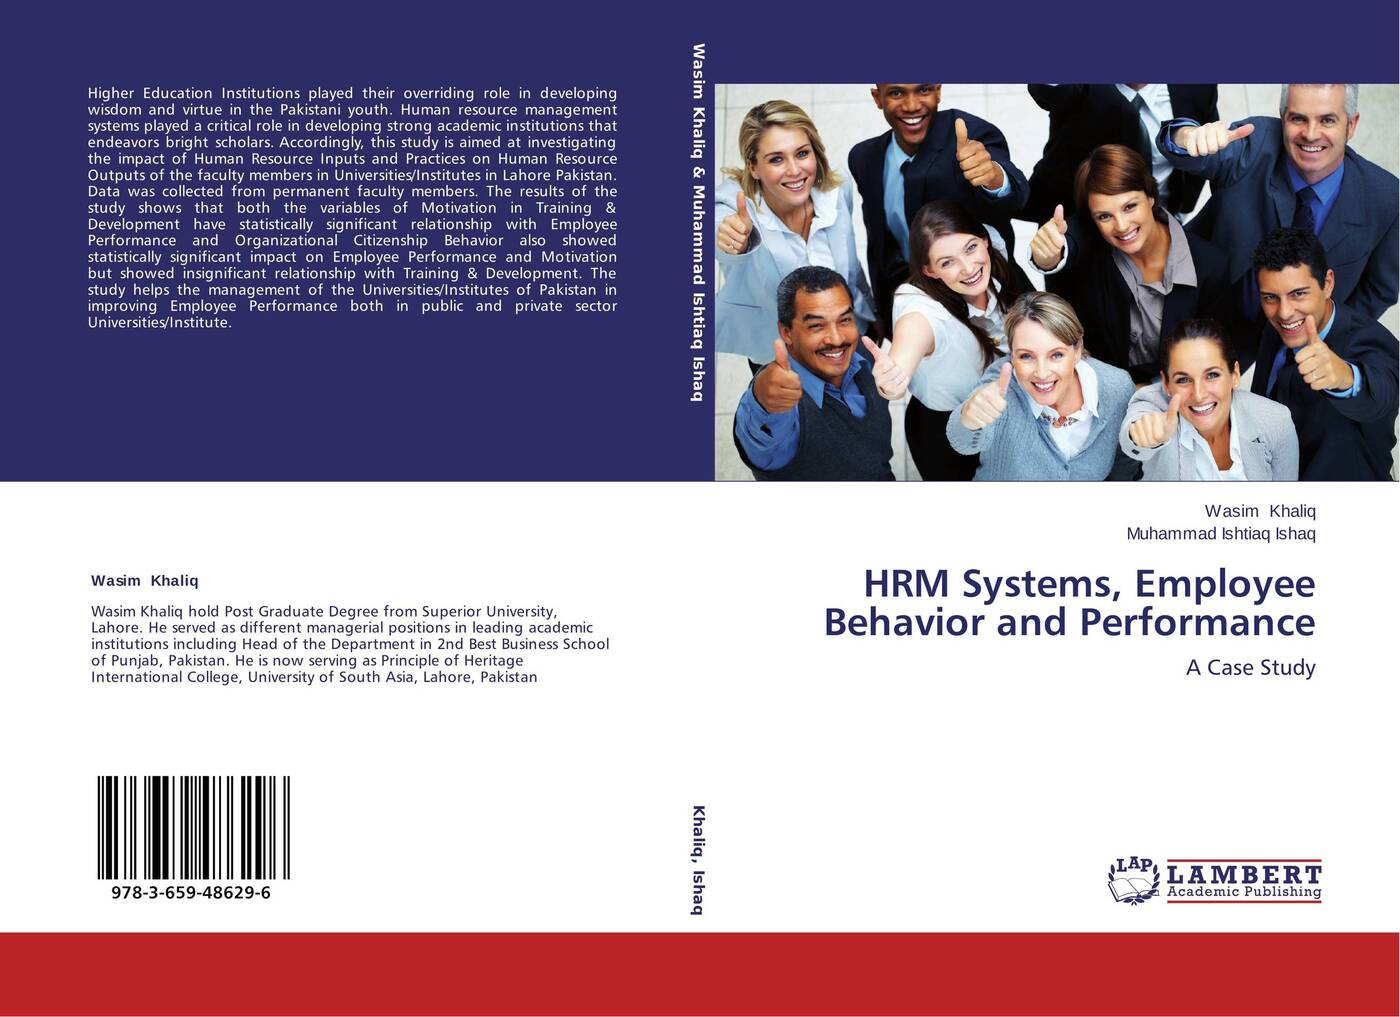 Wasim Khaliq and Muhammad Ishtiaq Ishaq HRM Systems, Employee Behavior and Performance muhammad altaf qureshi universalization of primary education in pakistan